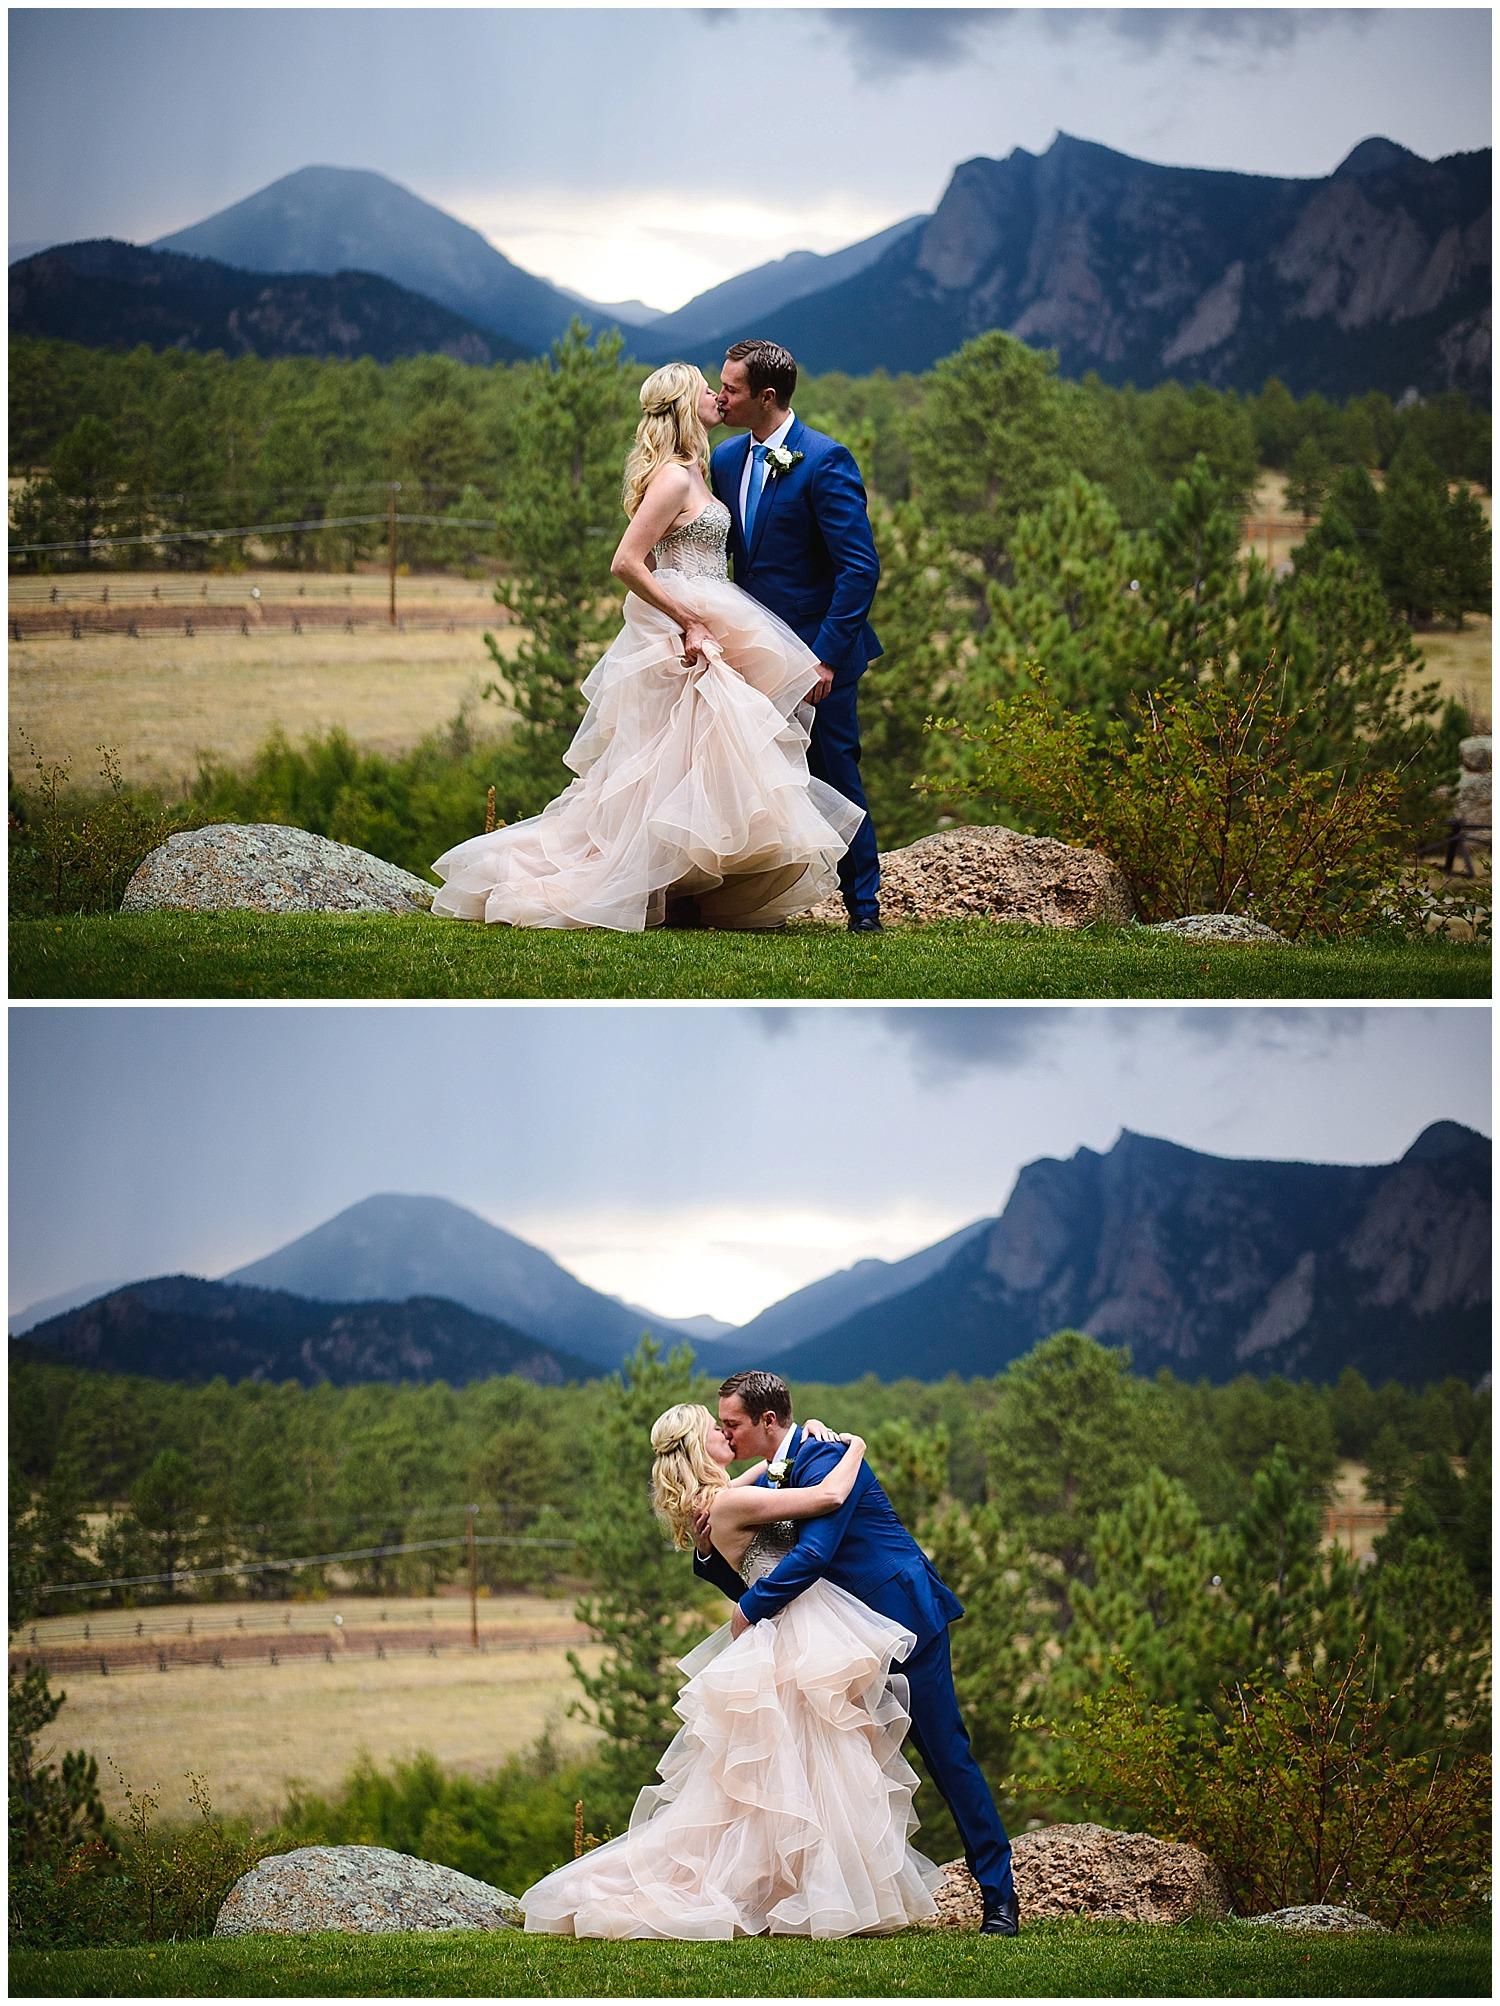 Estes-Park-Black-Canyon-Inn-Wedding-photography-_0065.jpg